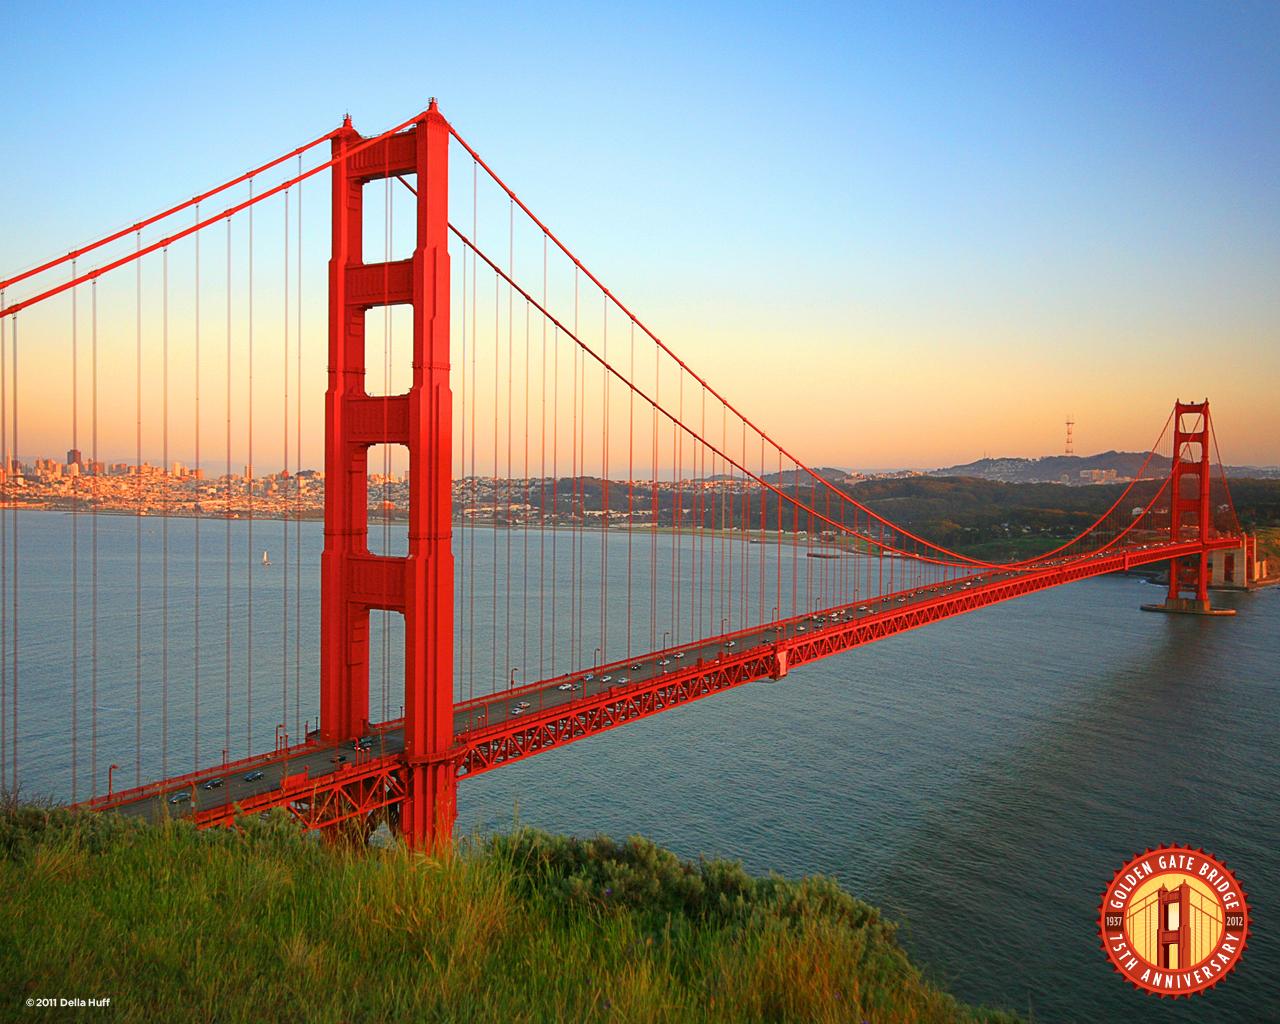 Free Download Download Wallpaper Golden Gate Bridge 75th Anniversary 1280x1024 For Your Desktop Mobile Tablet Explore 73 Golden Gate Bridge Wallpaper Golden Wallpapers Golden Gate Bridge Wallpaper Hd Bing